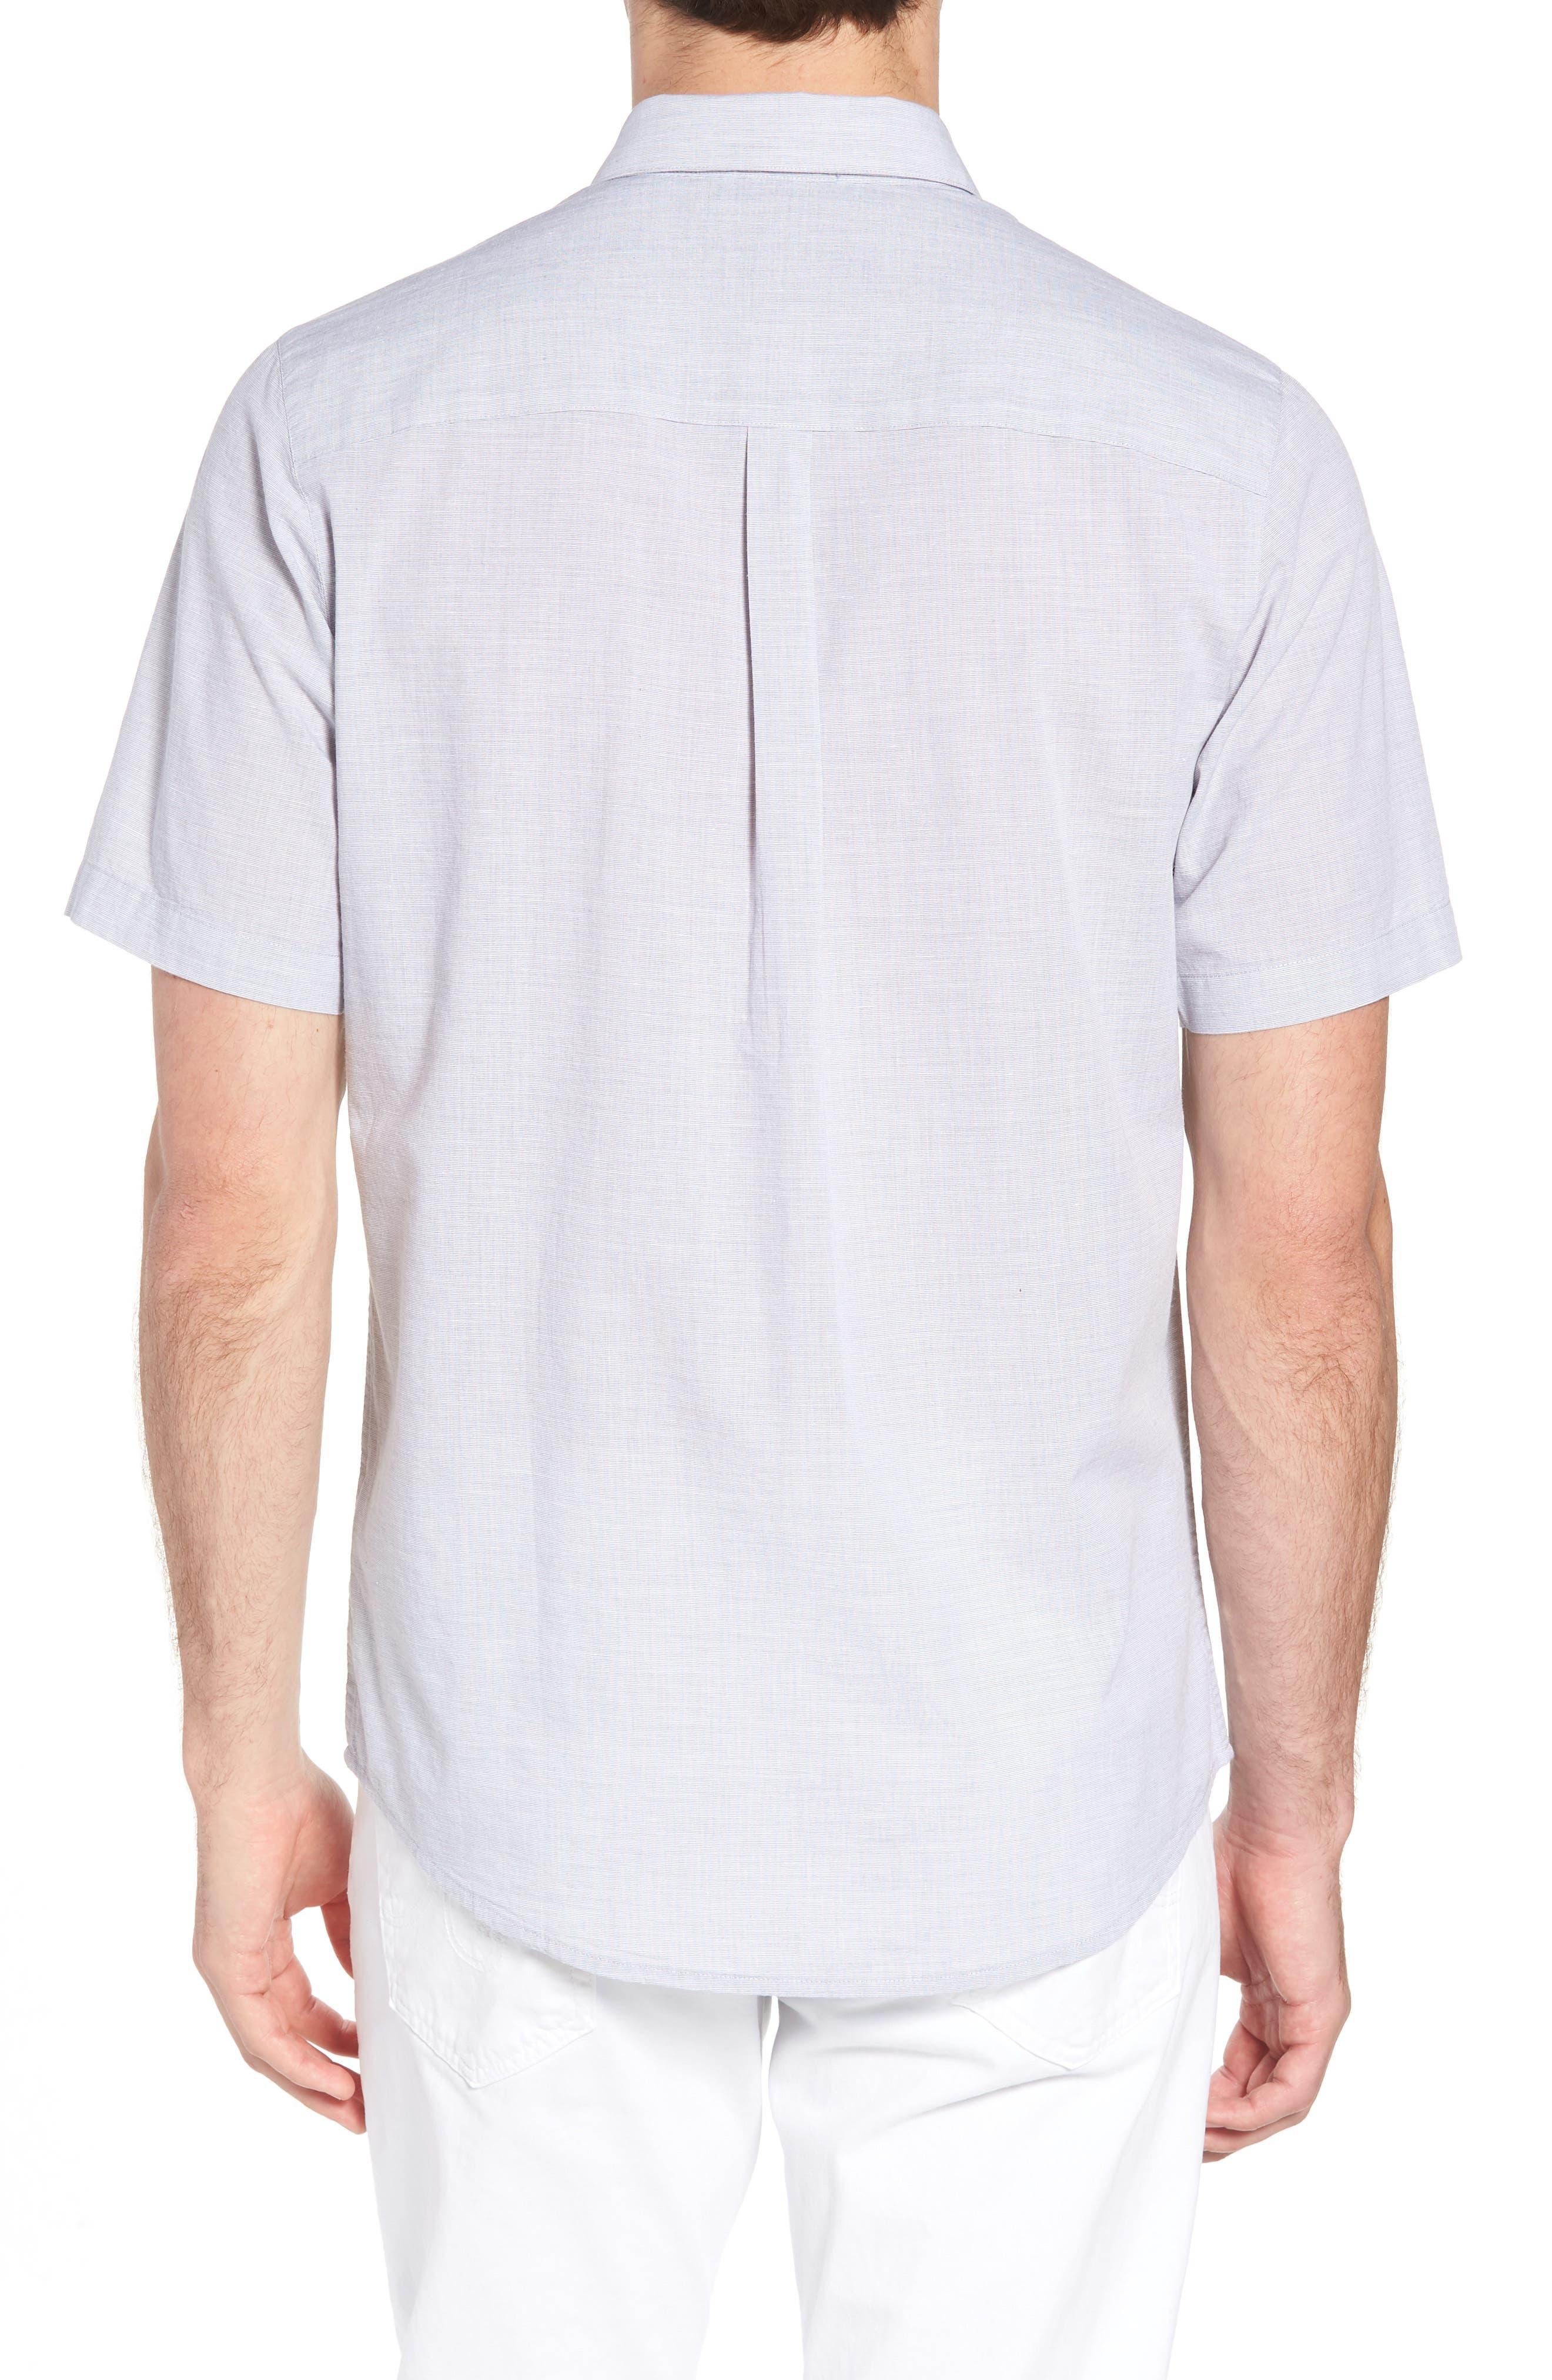 Oscar Regular Fit Sport Shirt,                             Alternate thumbnail 2, color,                             HEATHER GRASILLE